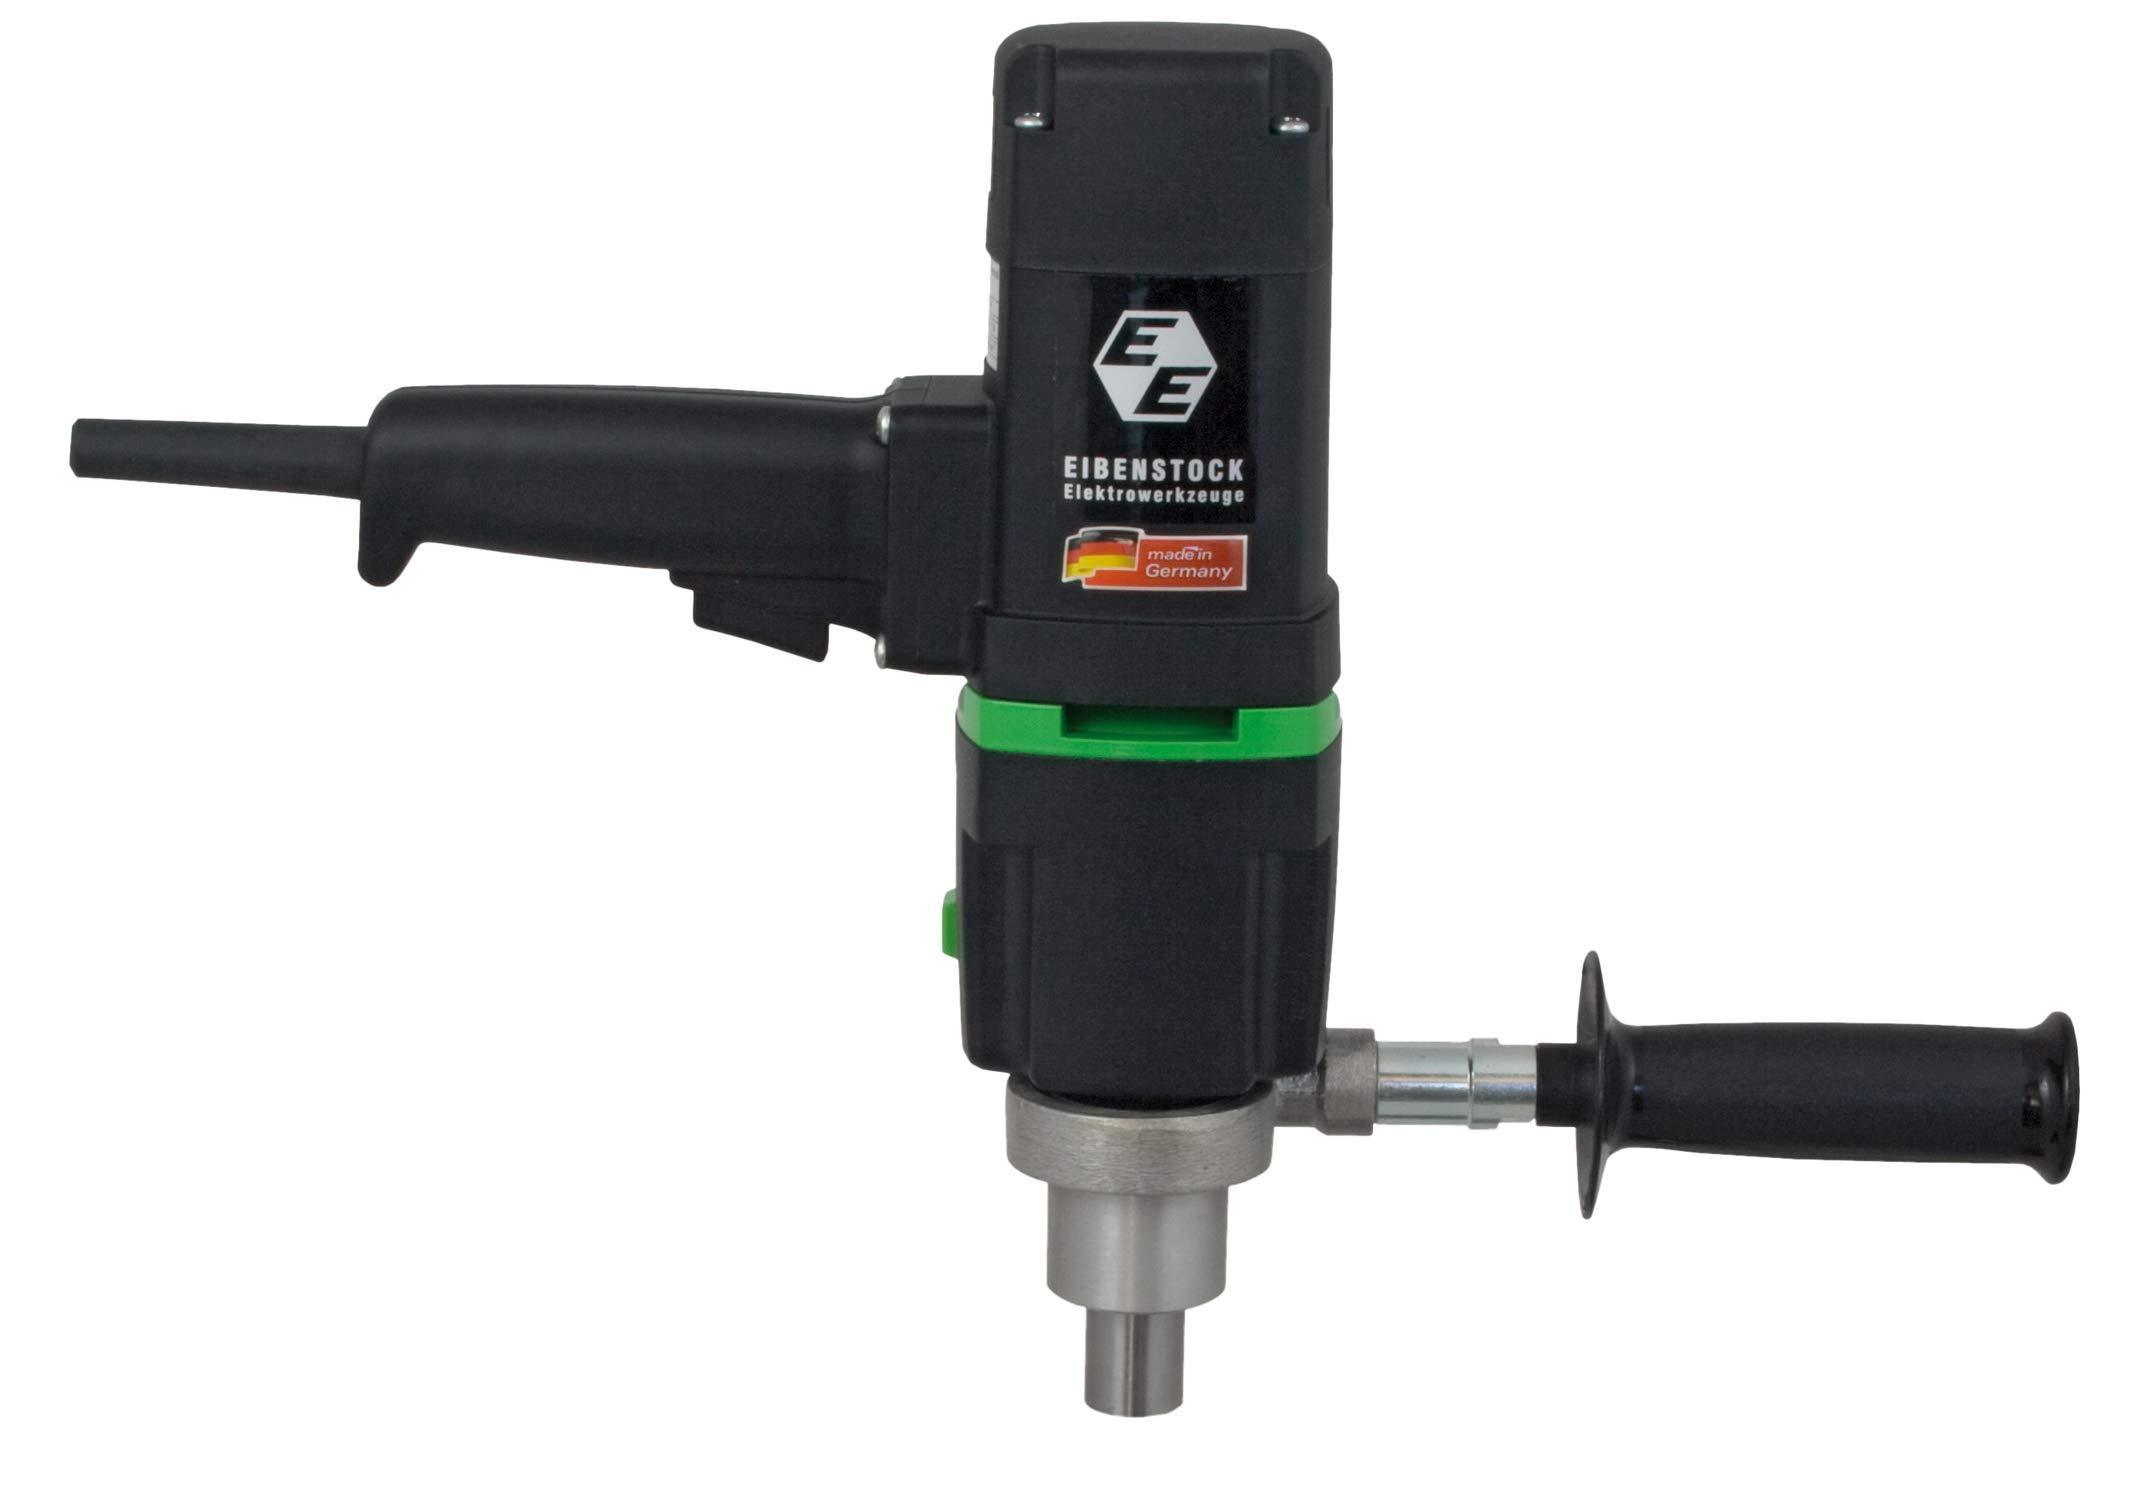 CS Unitec EHB 20/2.4 10.5 Amp 110 V Hand-Held Drill/Drill Motor by C.S. Unitec